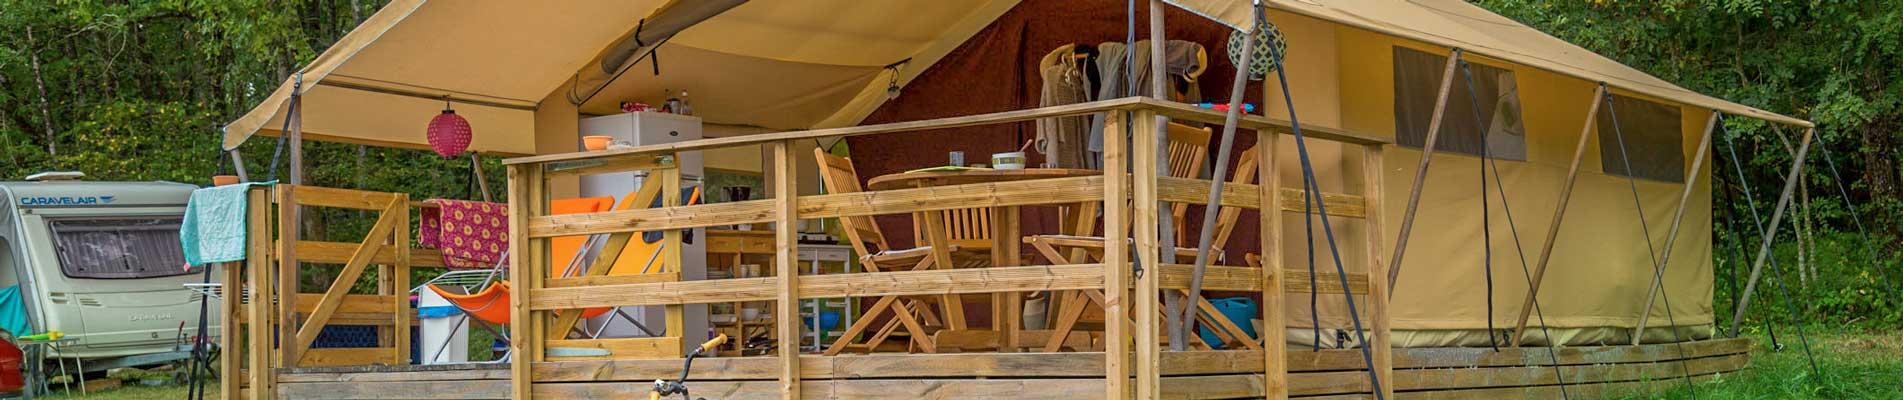 camping location tente cottage périgord